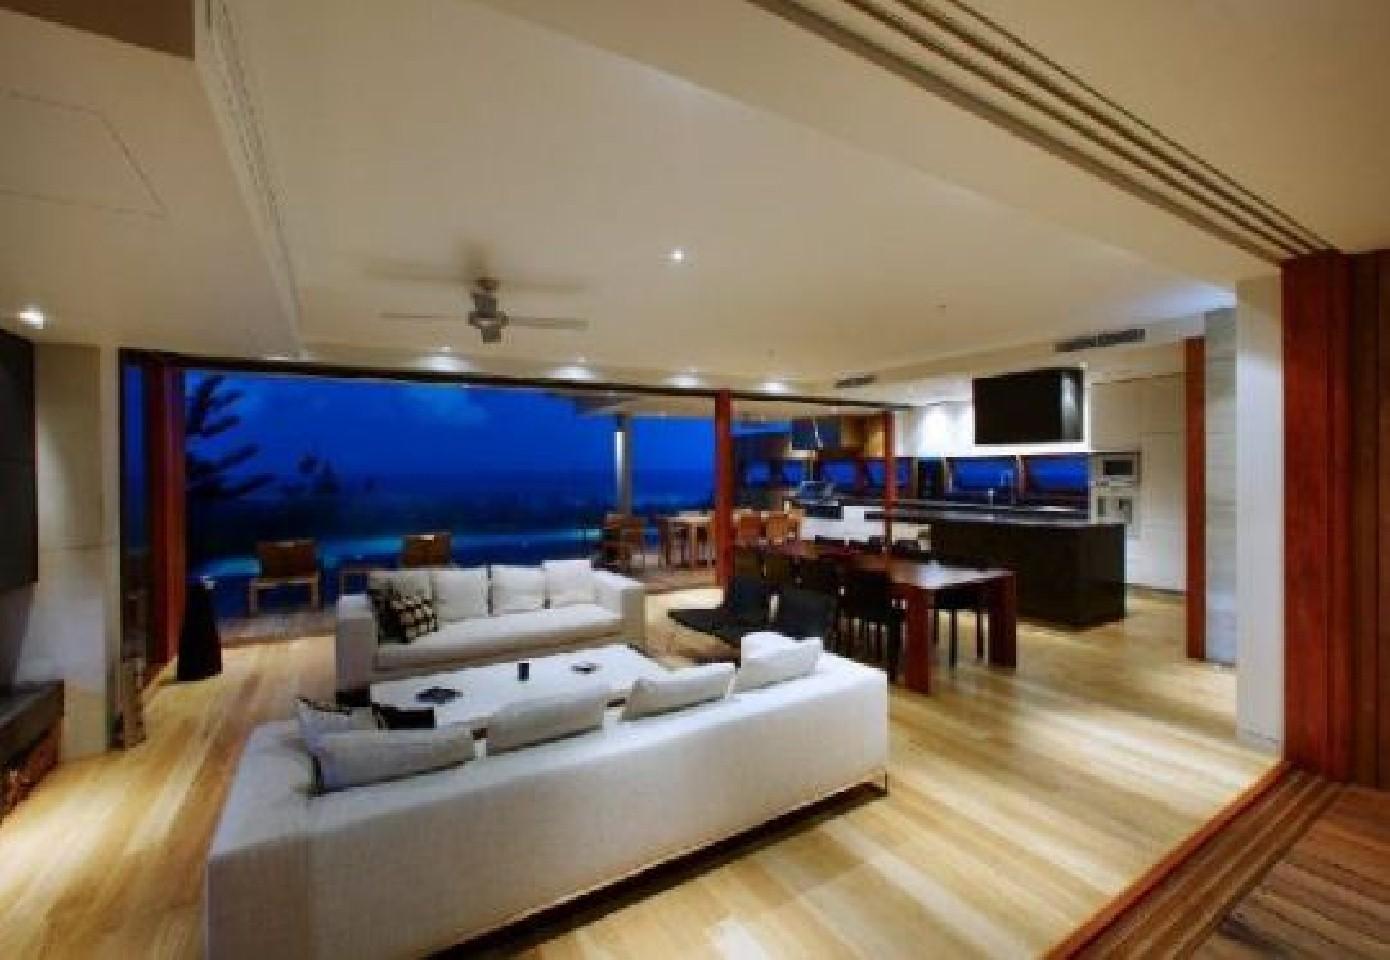 beach house interior for 2013 design orientation Beach House Interior ...